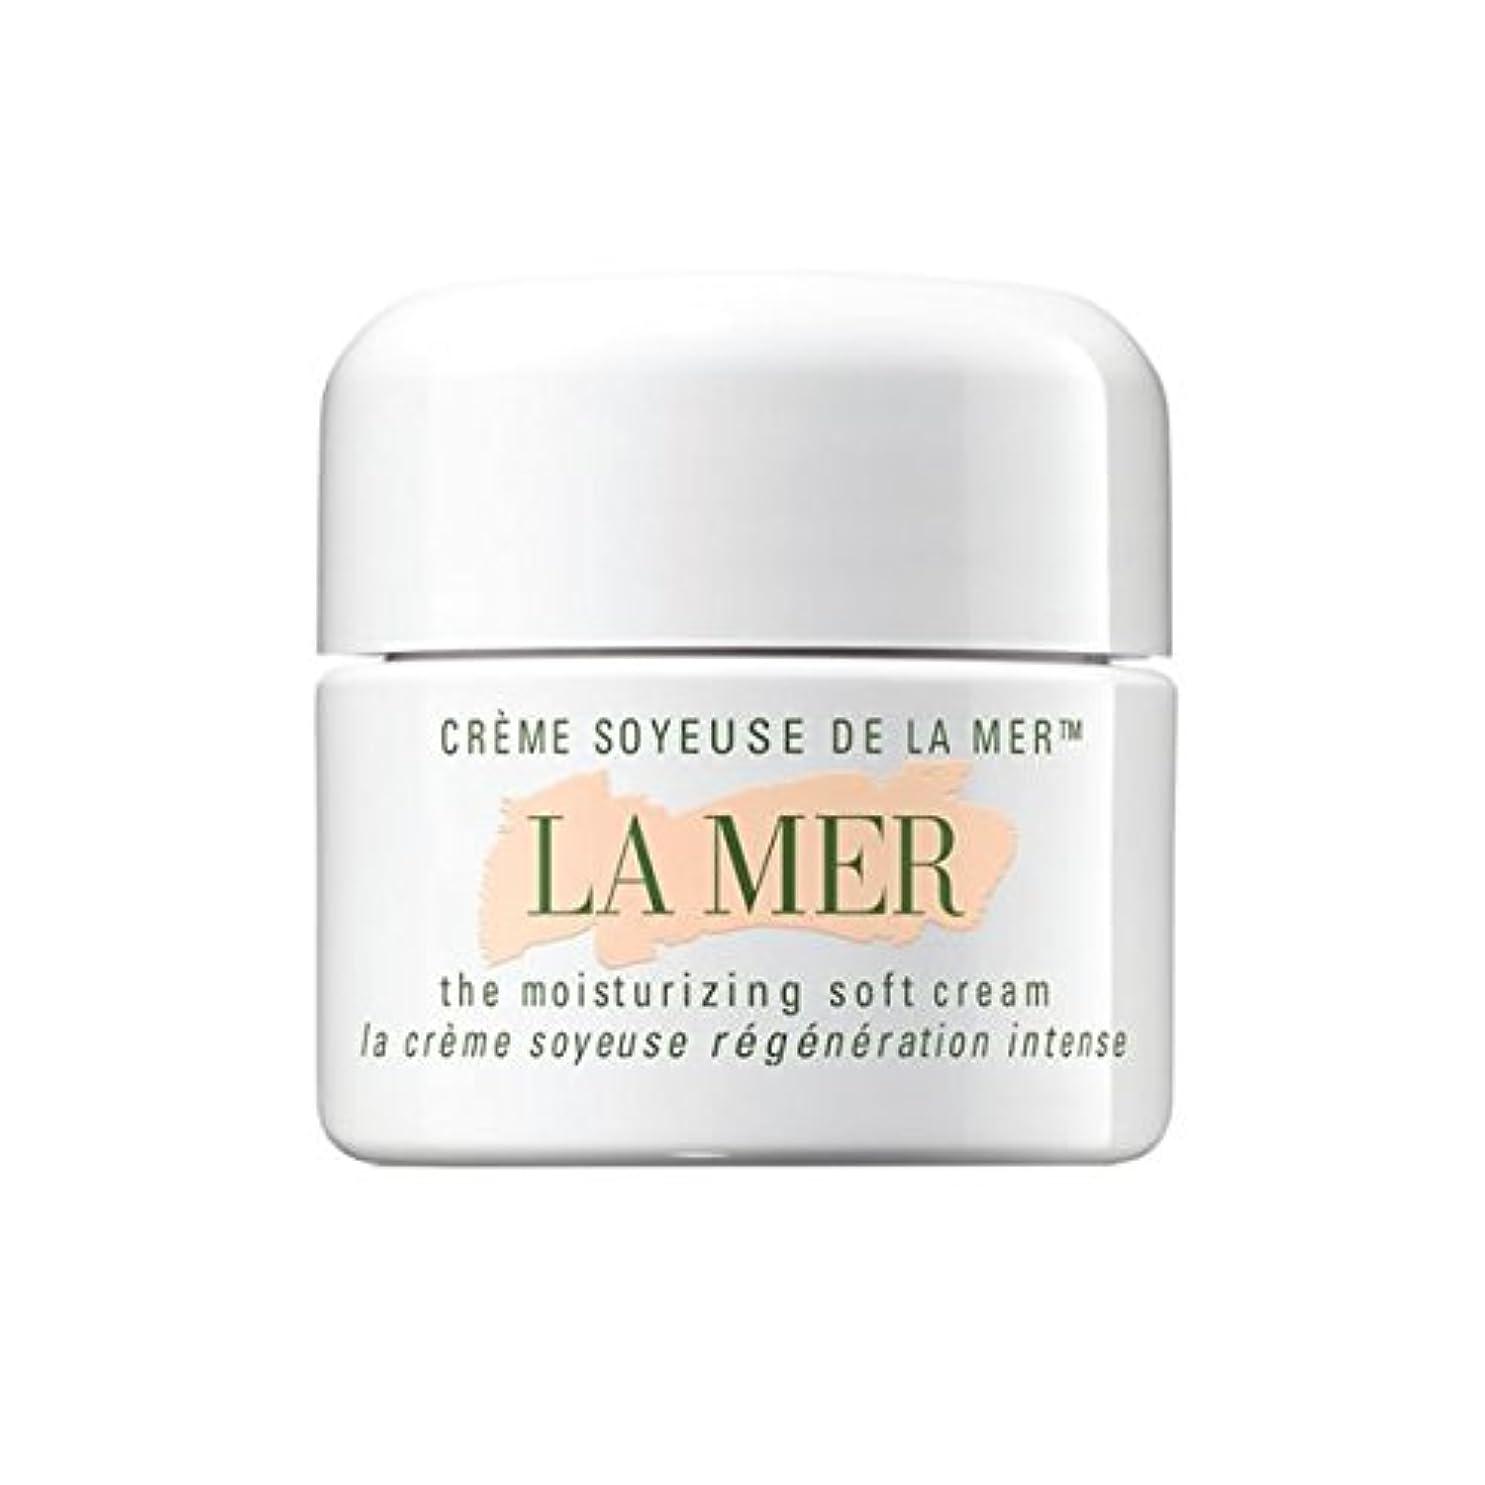 La Mer The Moisturizing Soft Cream 60ml [並行輸入品]